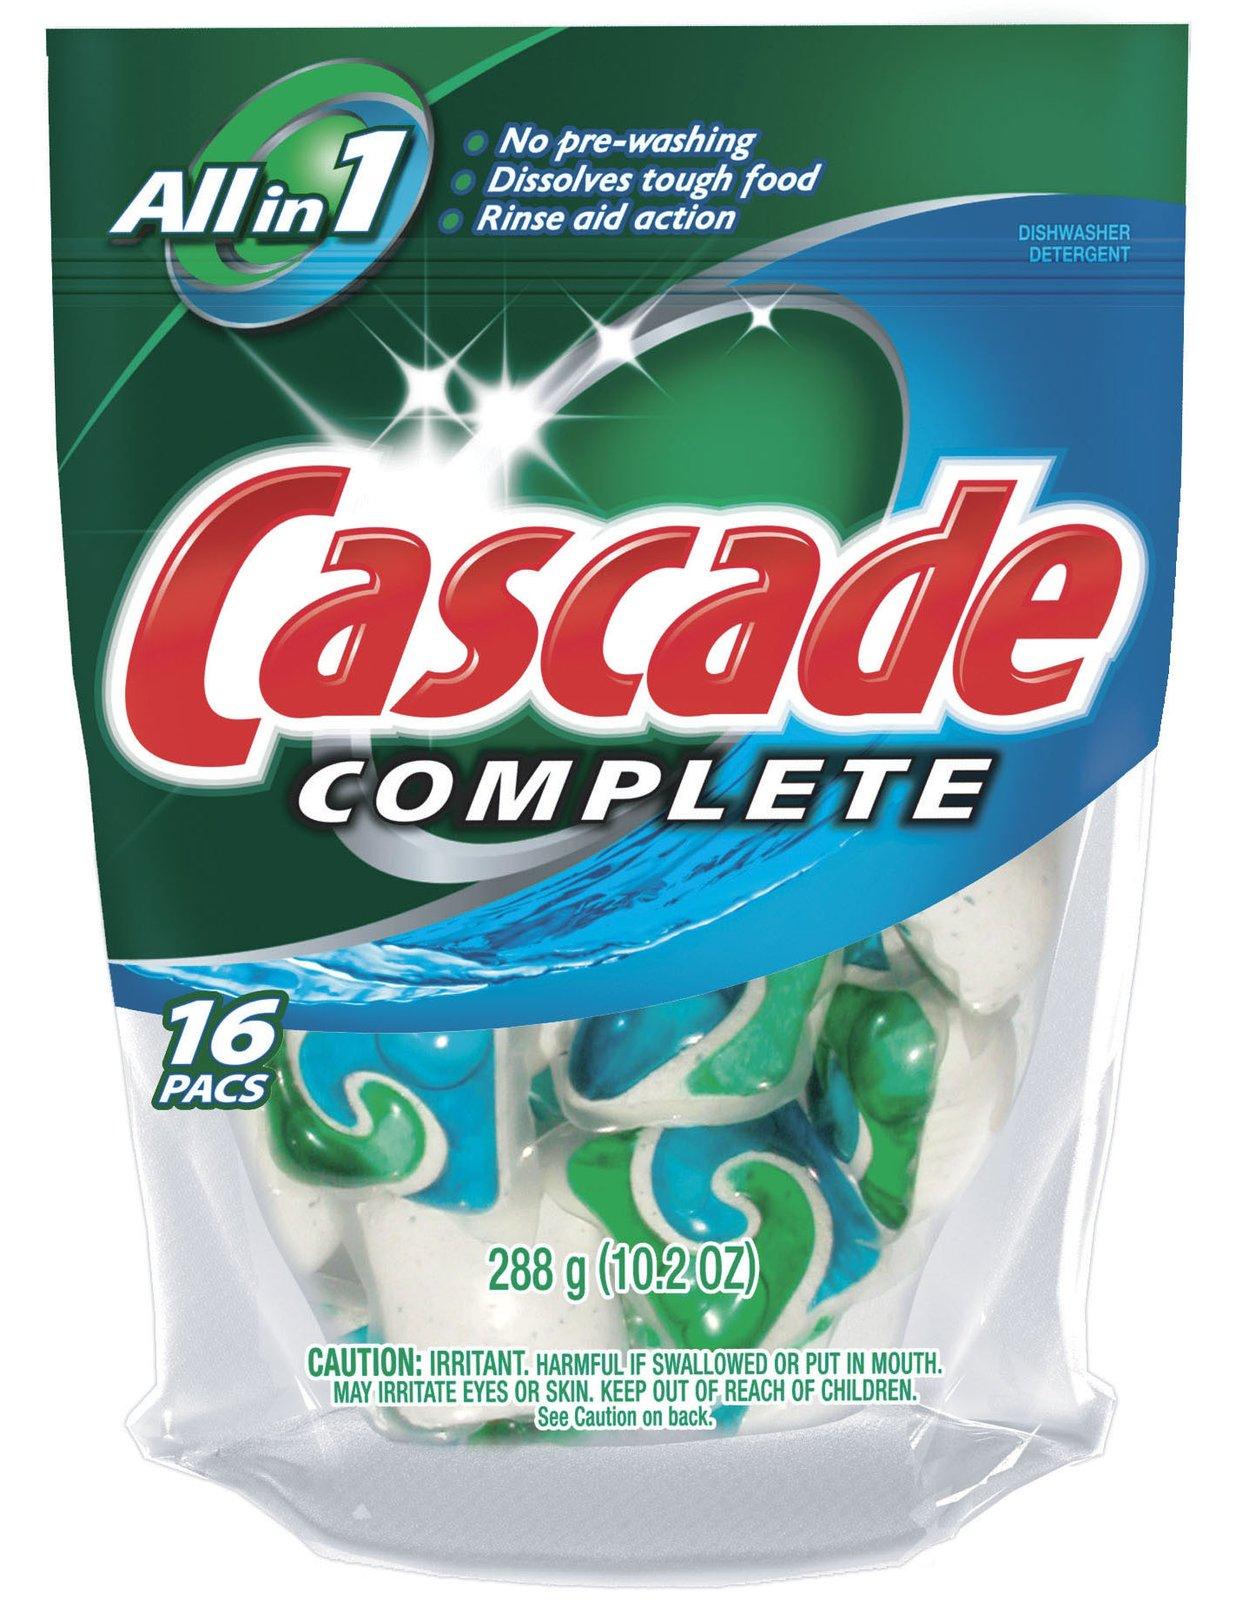 Blog_Cascade